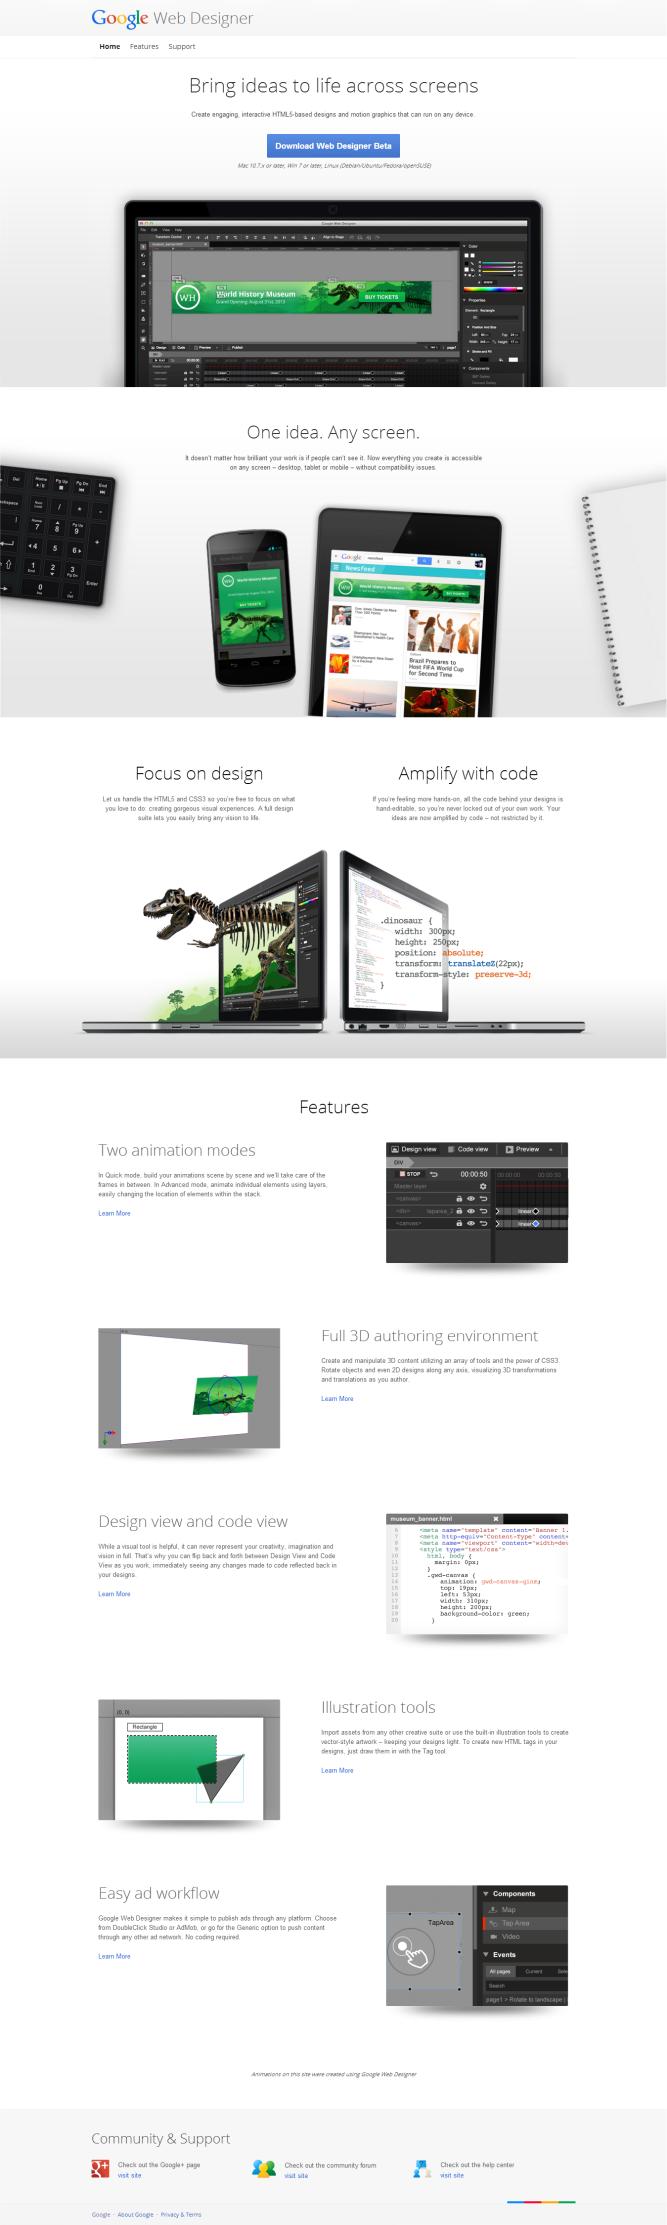 Google Web Designer [Pantalla principal]